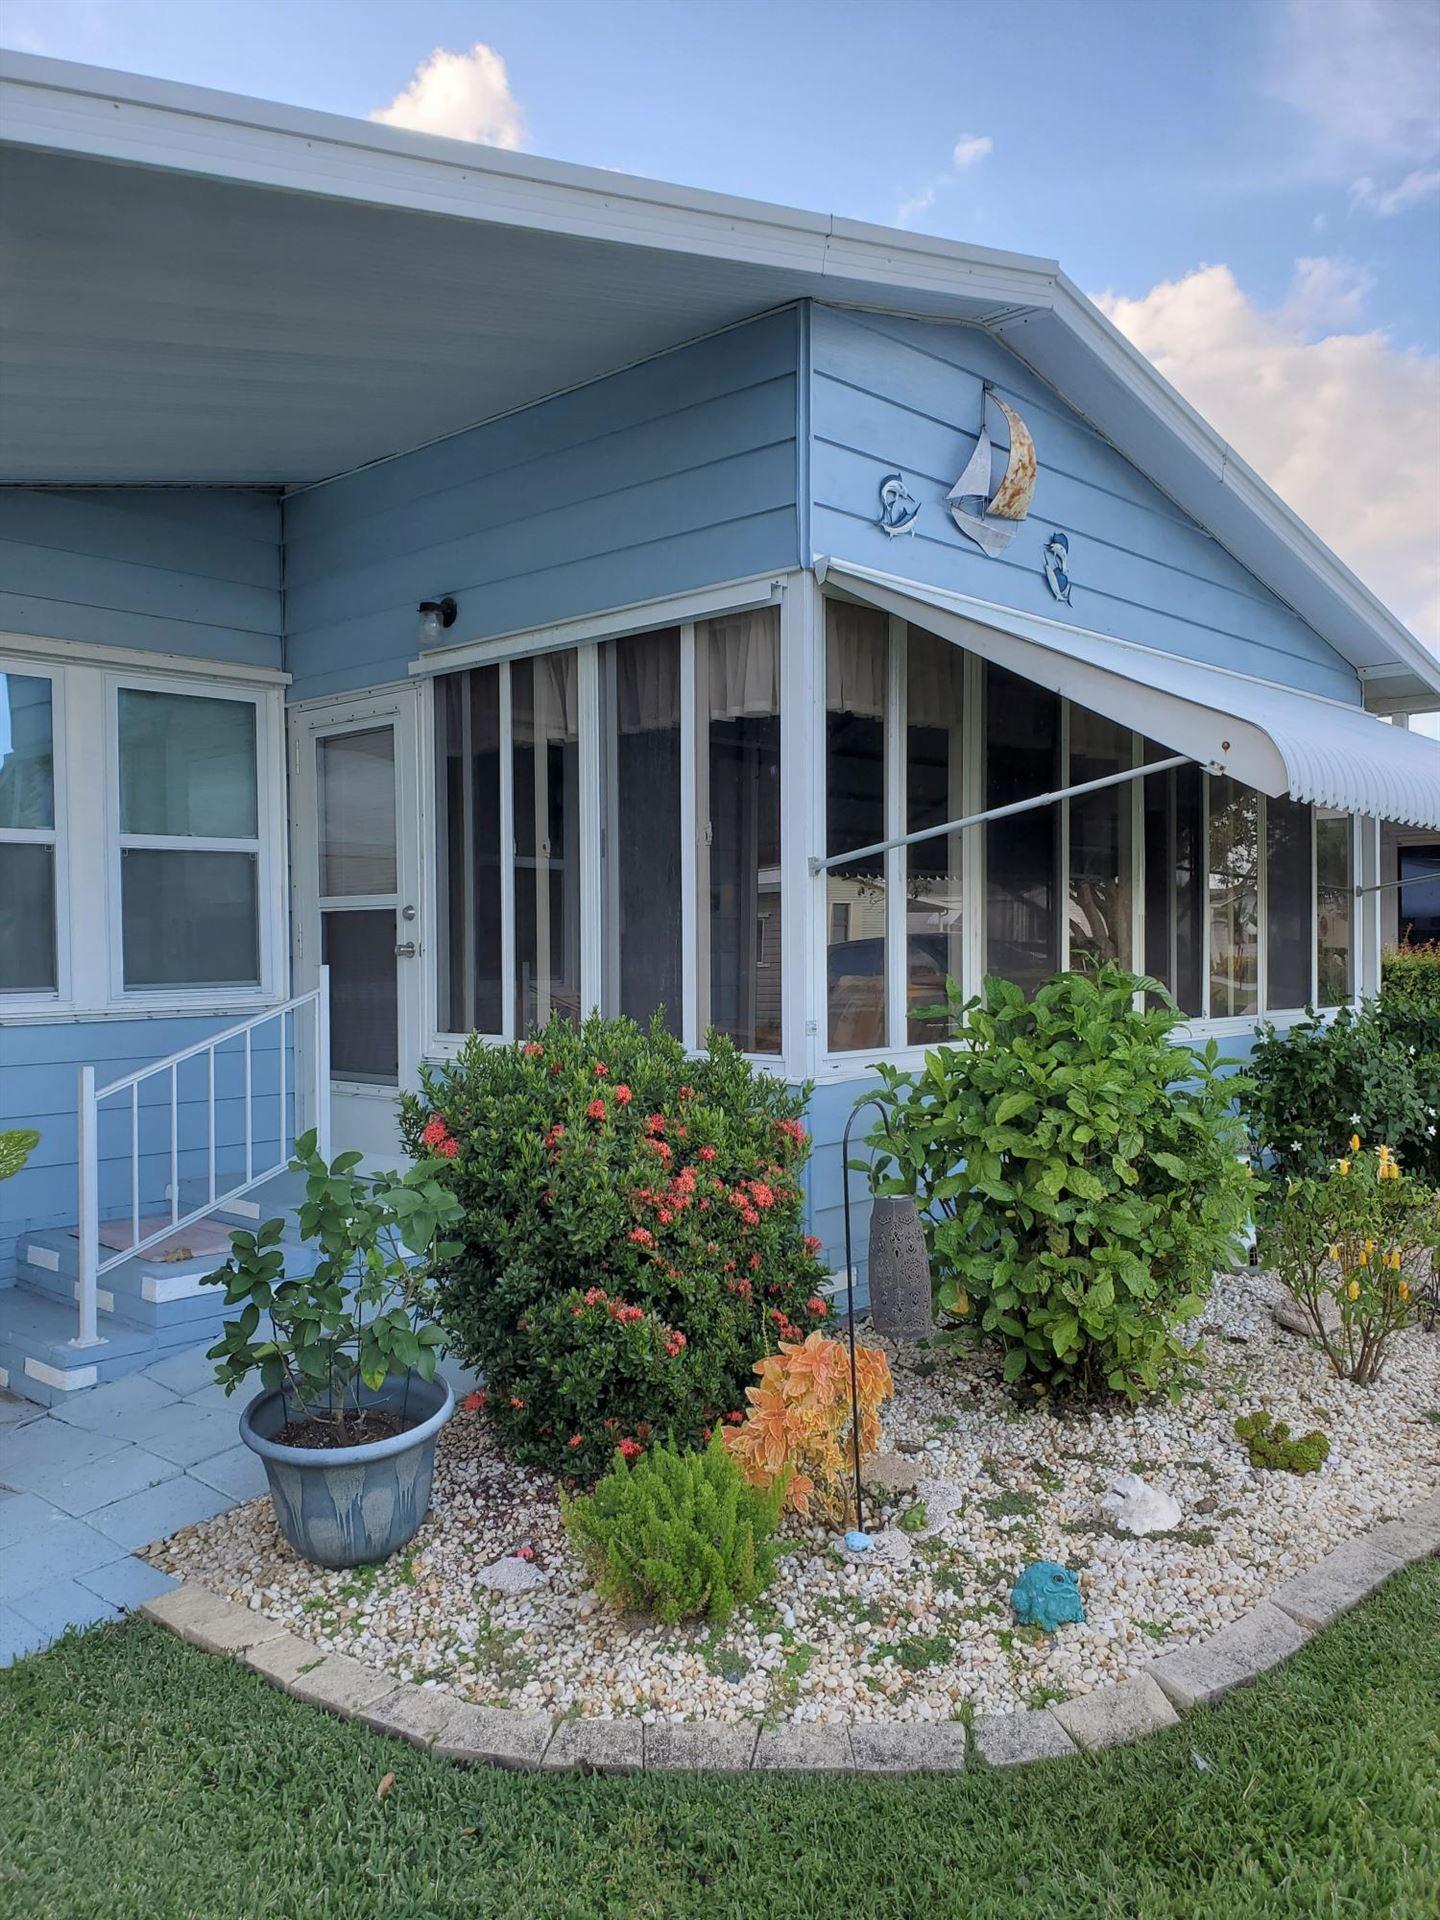 2969 Fiddlewood Circle, Port Saint Lucie, FL 34952 - MLS#: RX-10682194